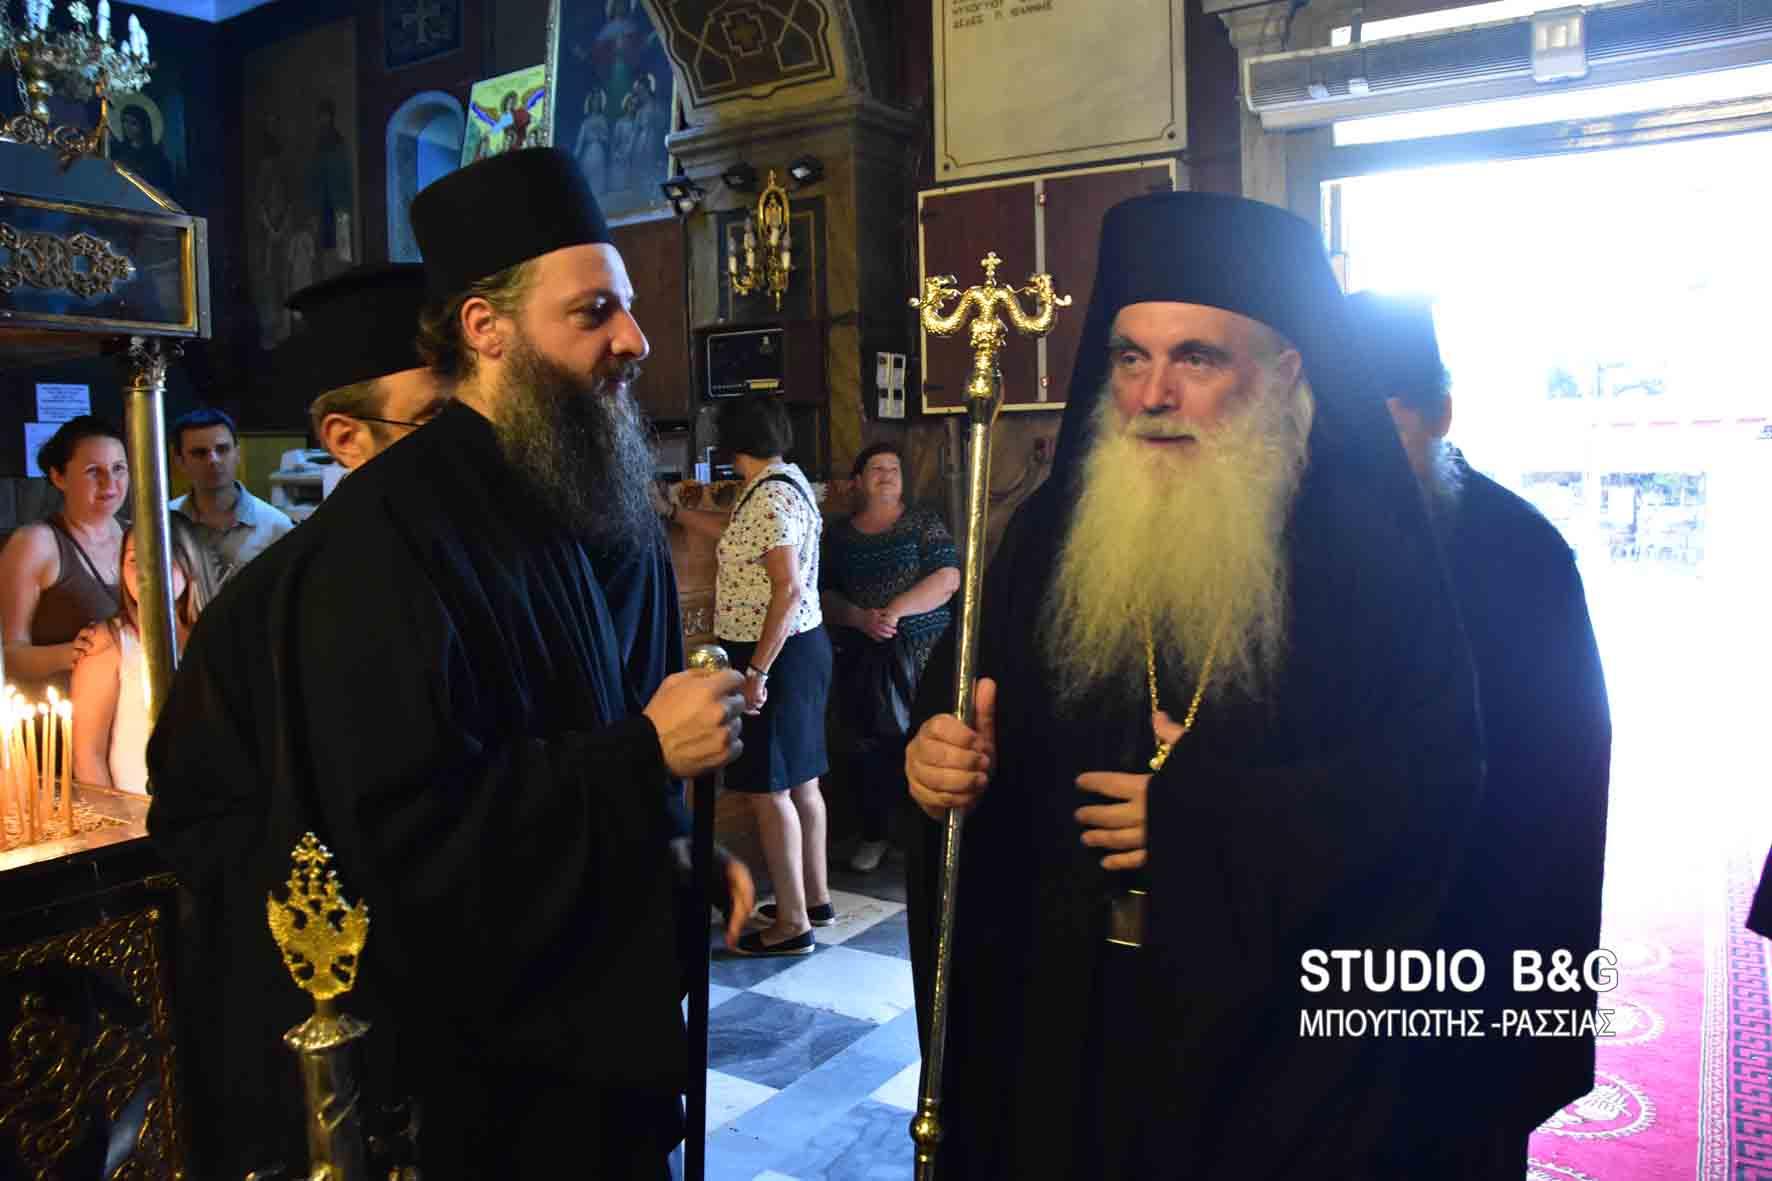 You are currently viewing Ομιλία με θέμα  ''Η Εκκλησία των Μαρτύρων''  του Μητροπολίτη Αργολίδος